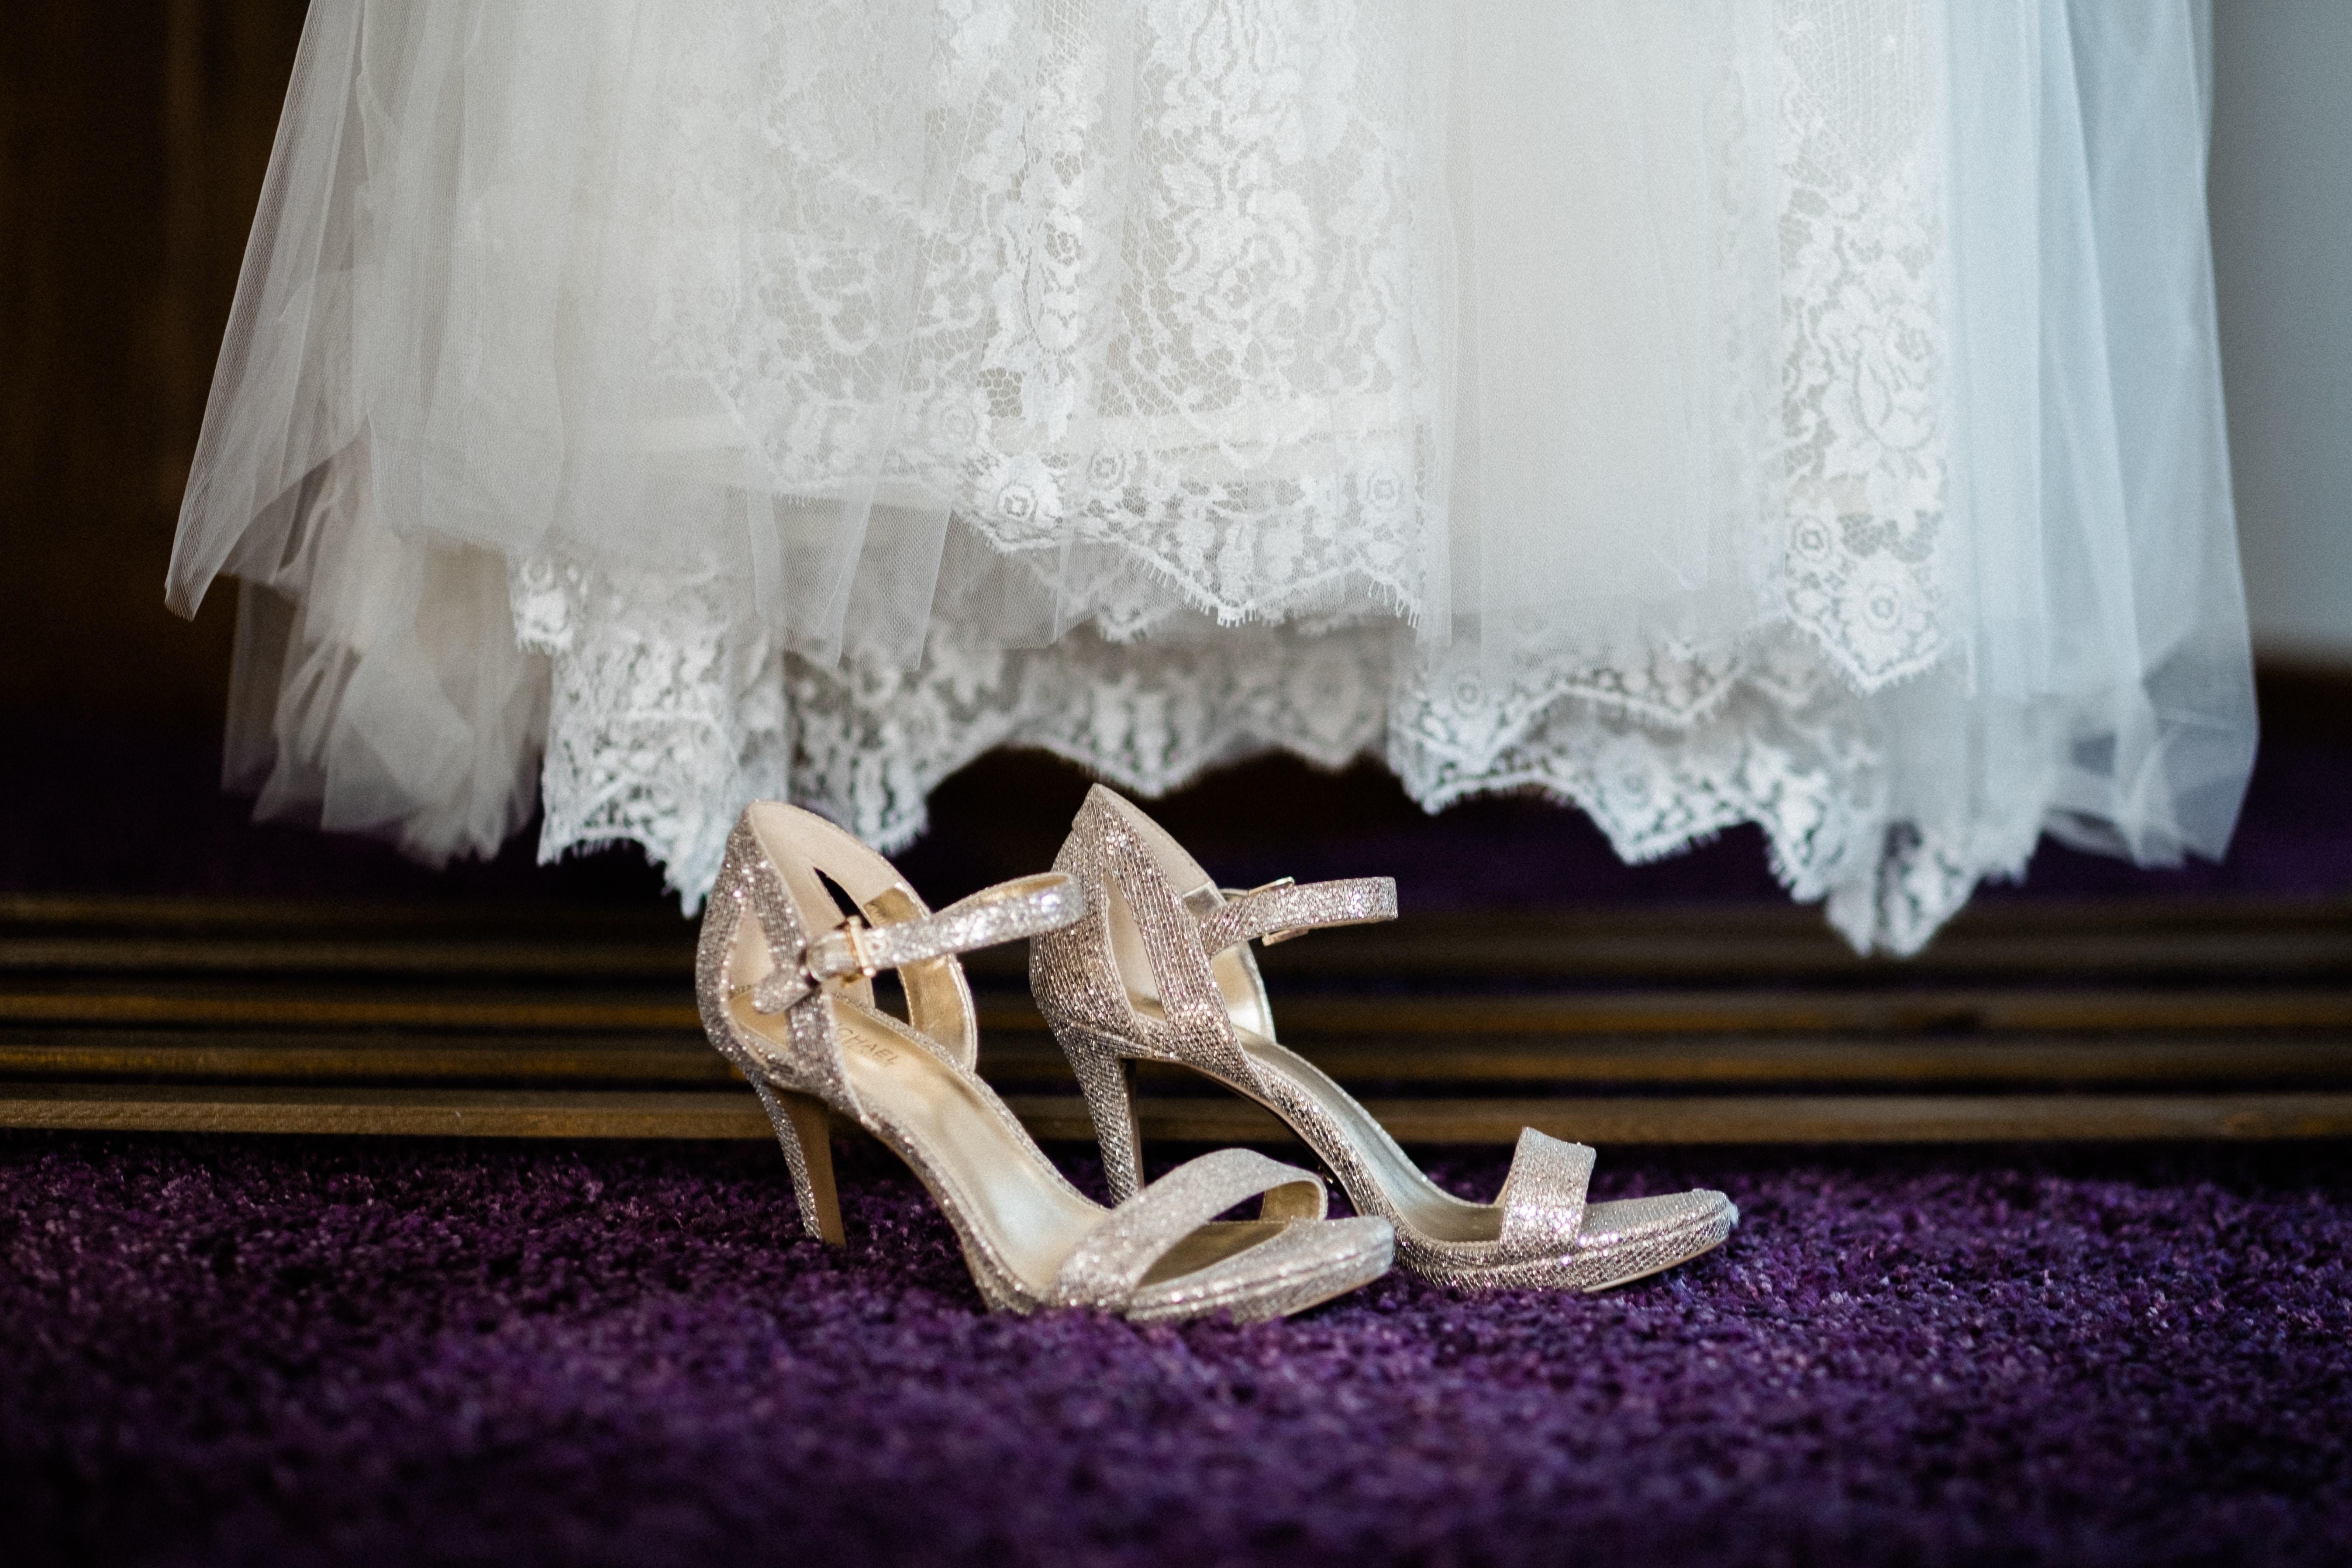 pair of white sandals